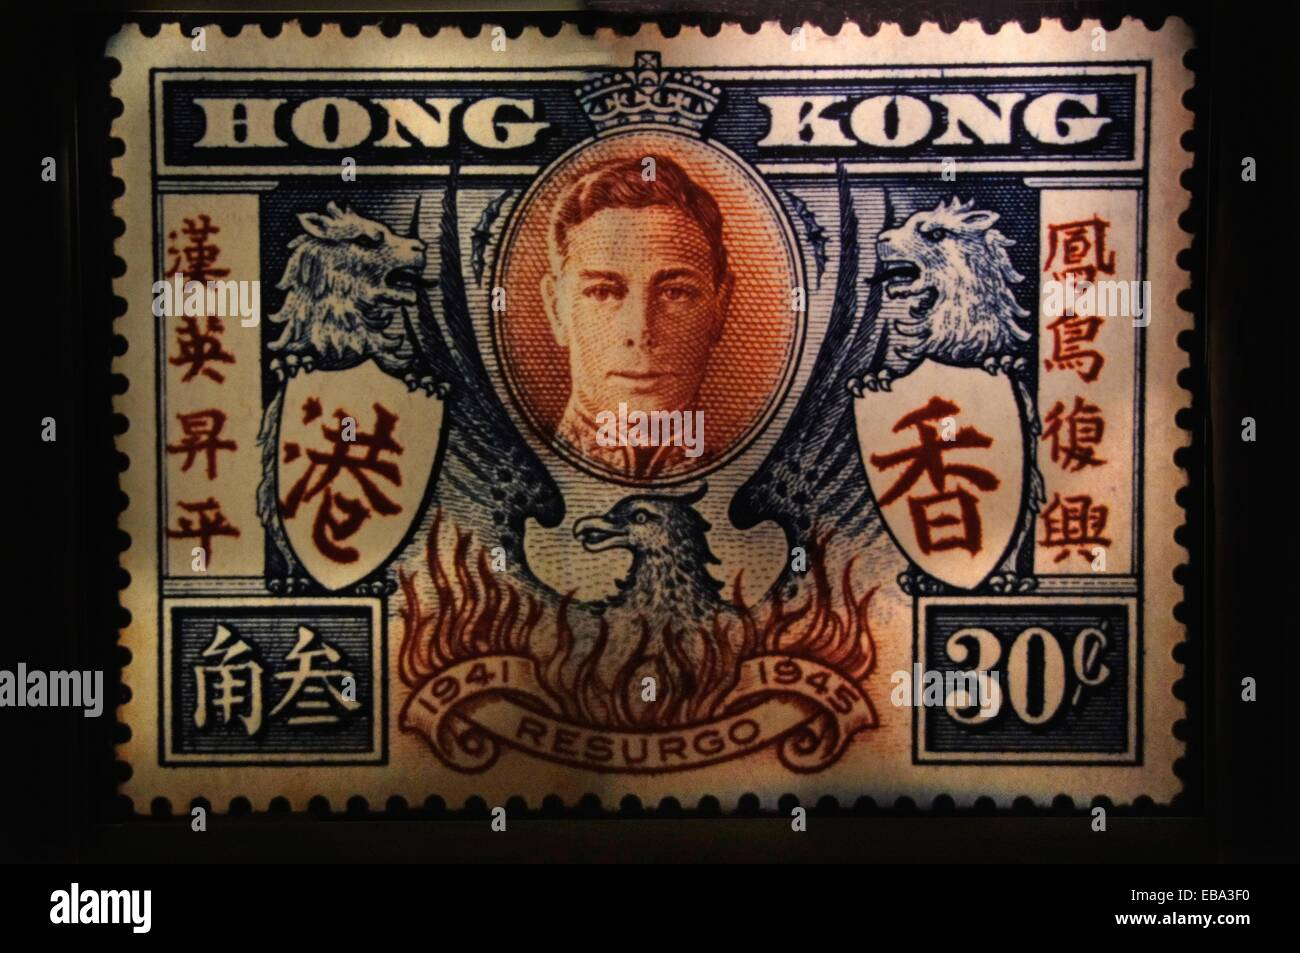 Postal stamp with King George VI, World War II, Hong Kong, China - Stock Image